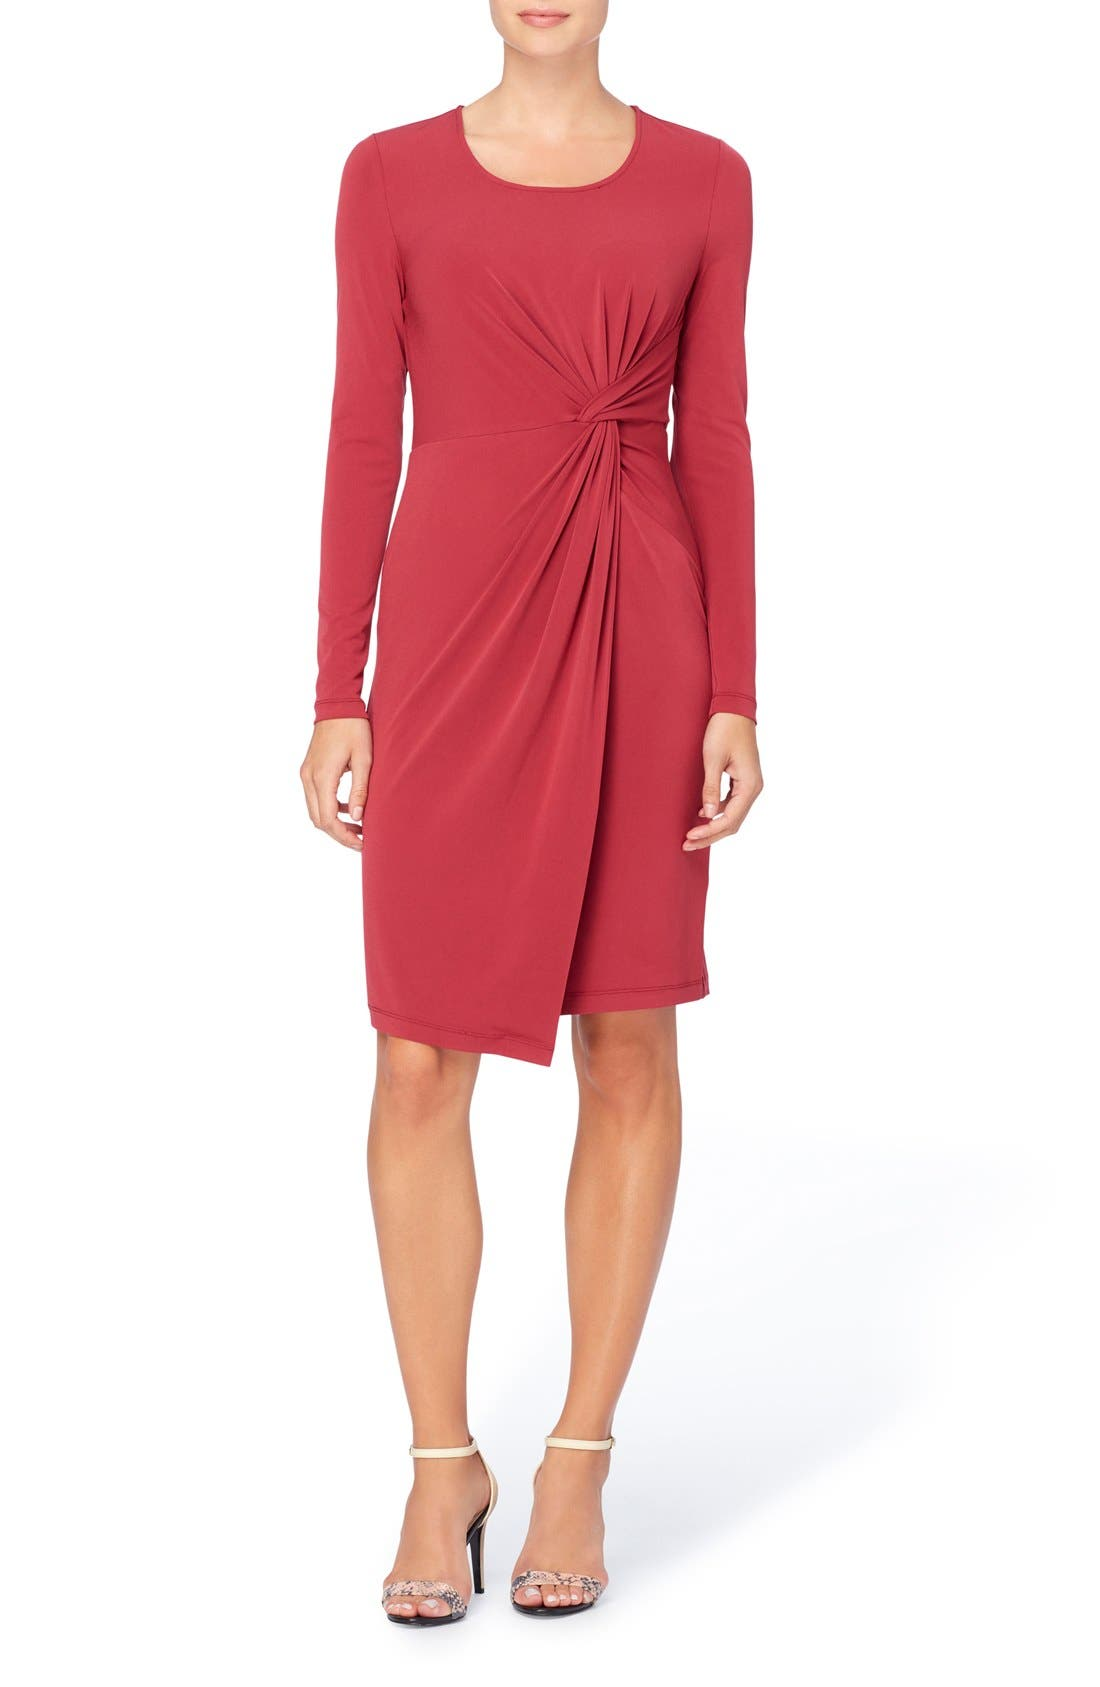 CATHERINE CATHERINE MALANDRINO Adele Twist Front Sheath Dress